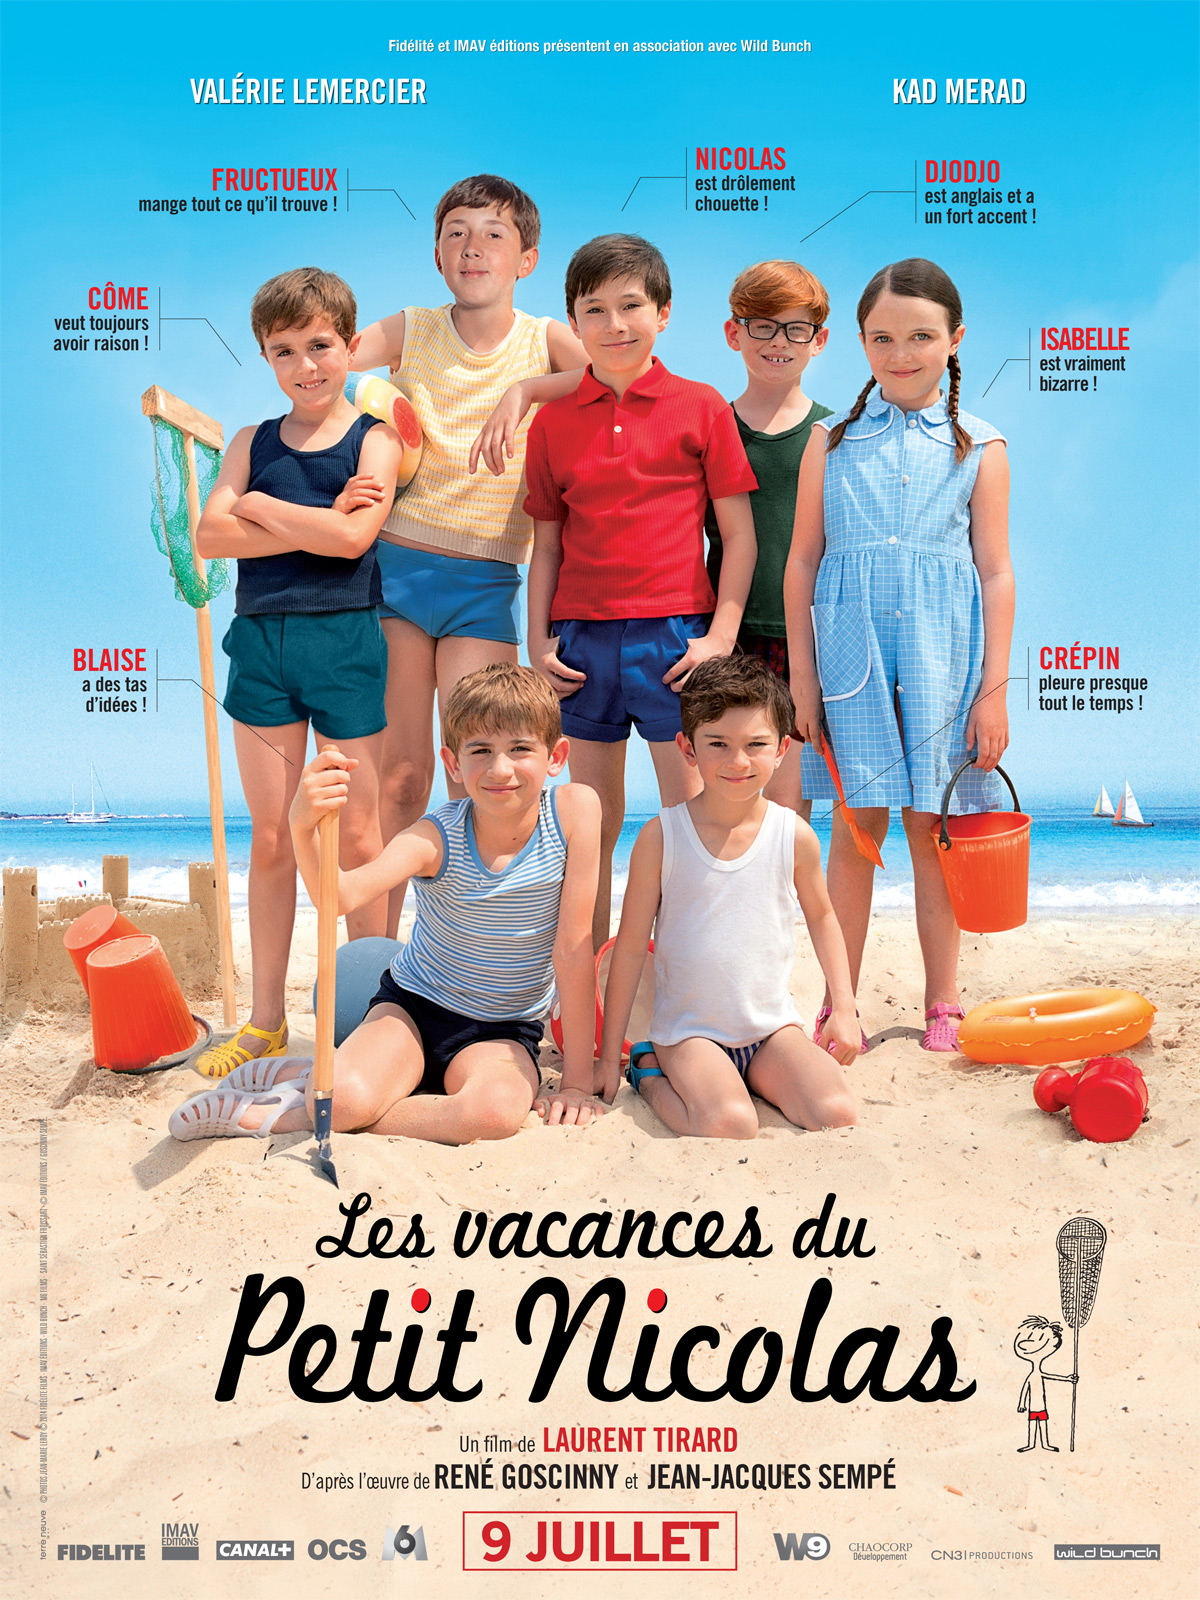 Les vacances du petit nicolas cin ma - Le petit nicolas film ...